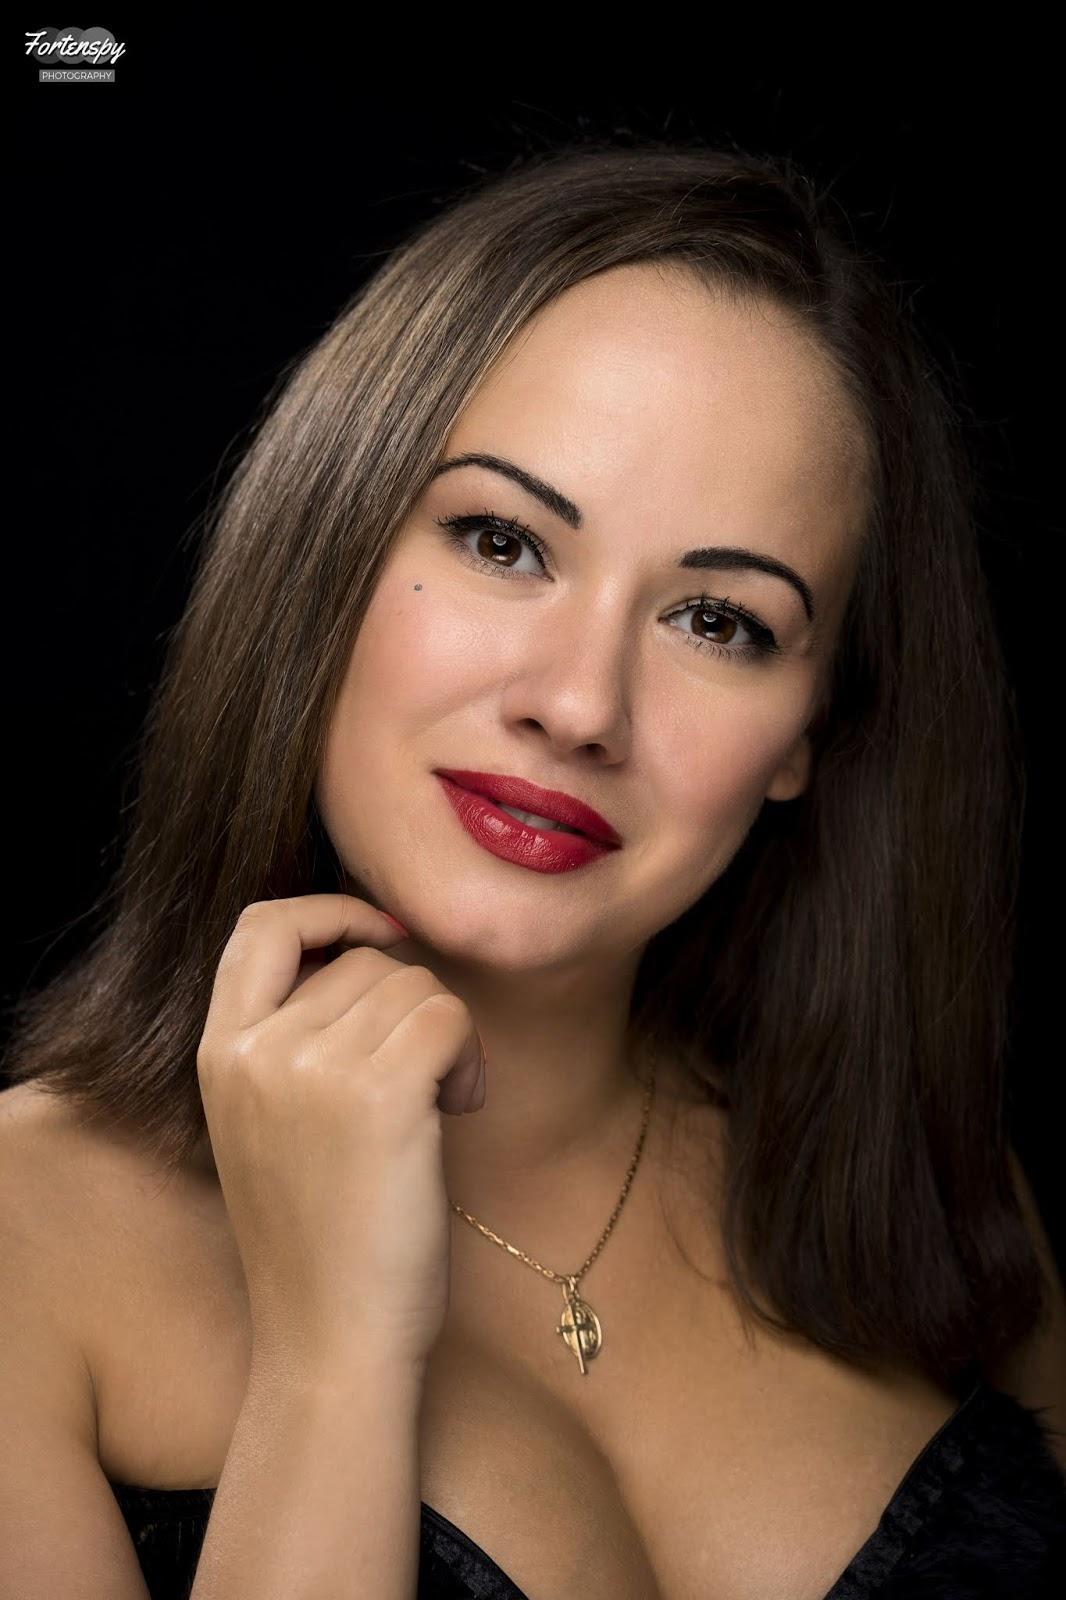 Annaxita Burlesque (Anastasiya Serbinova Varavina)